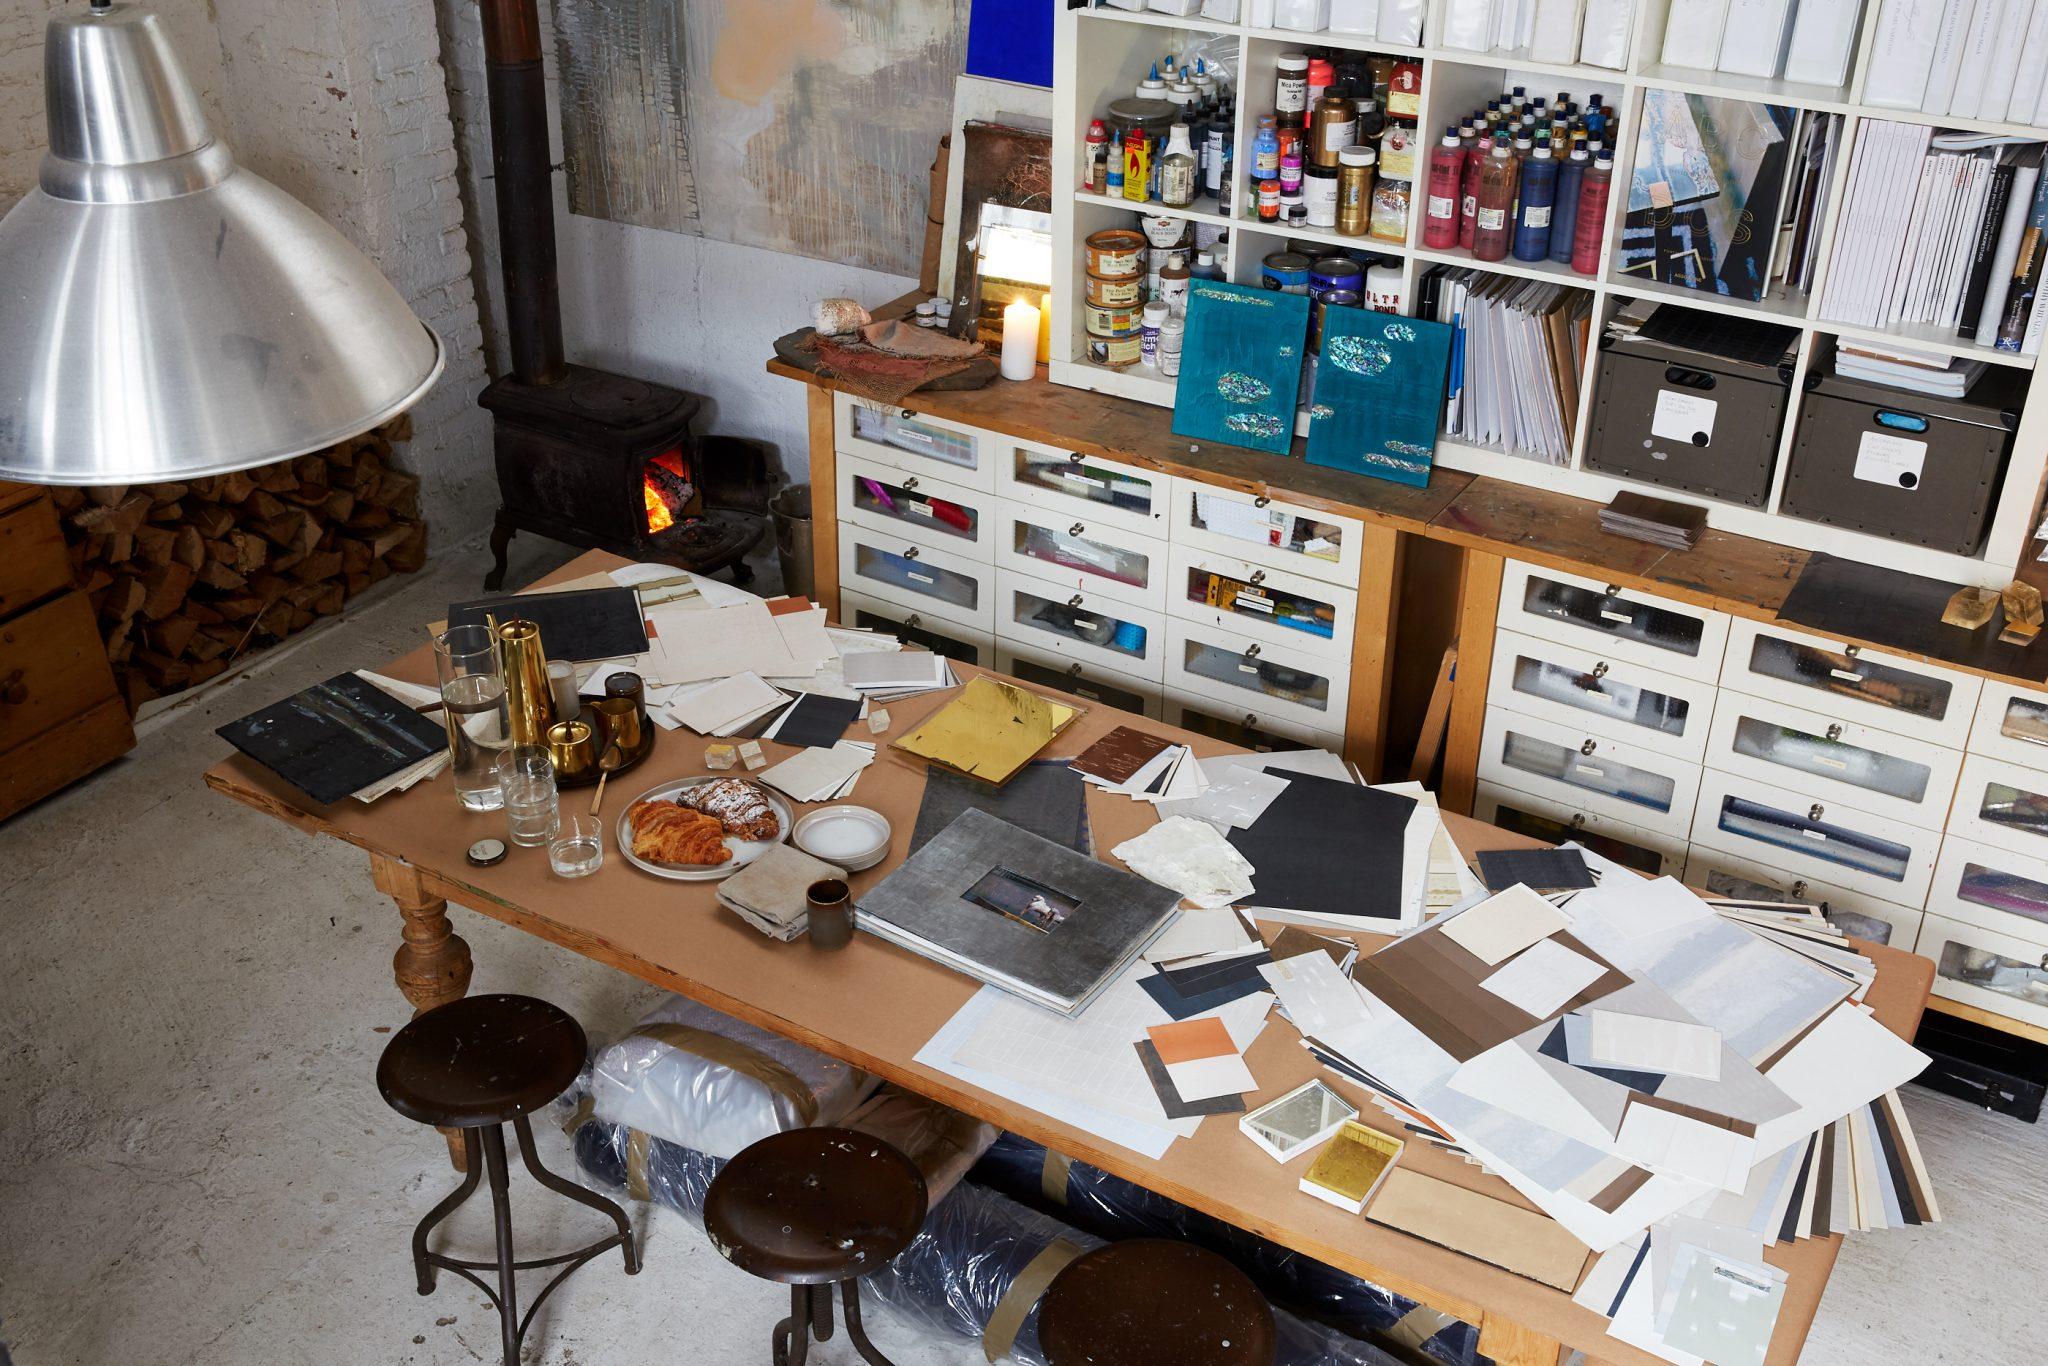 Ronen Lev studio Visit and Interivew with Callidus Guild